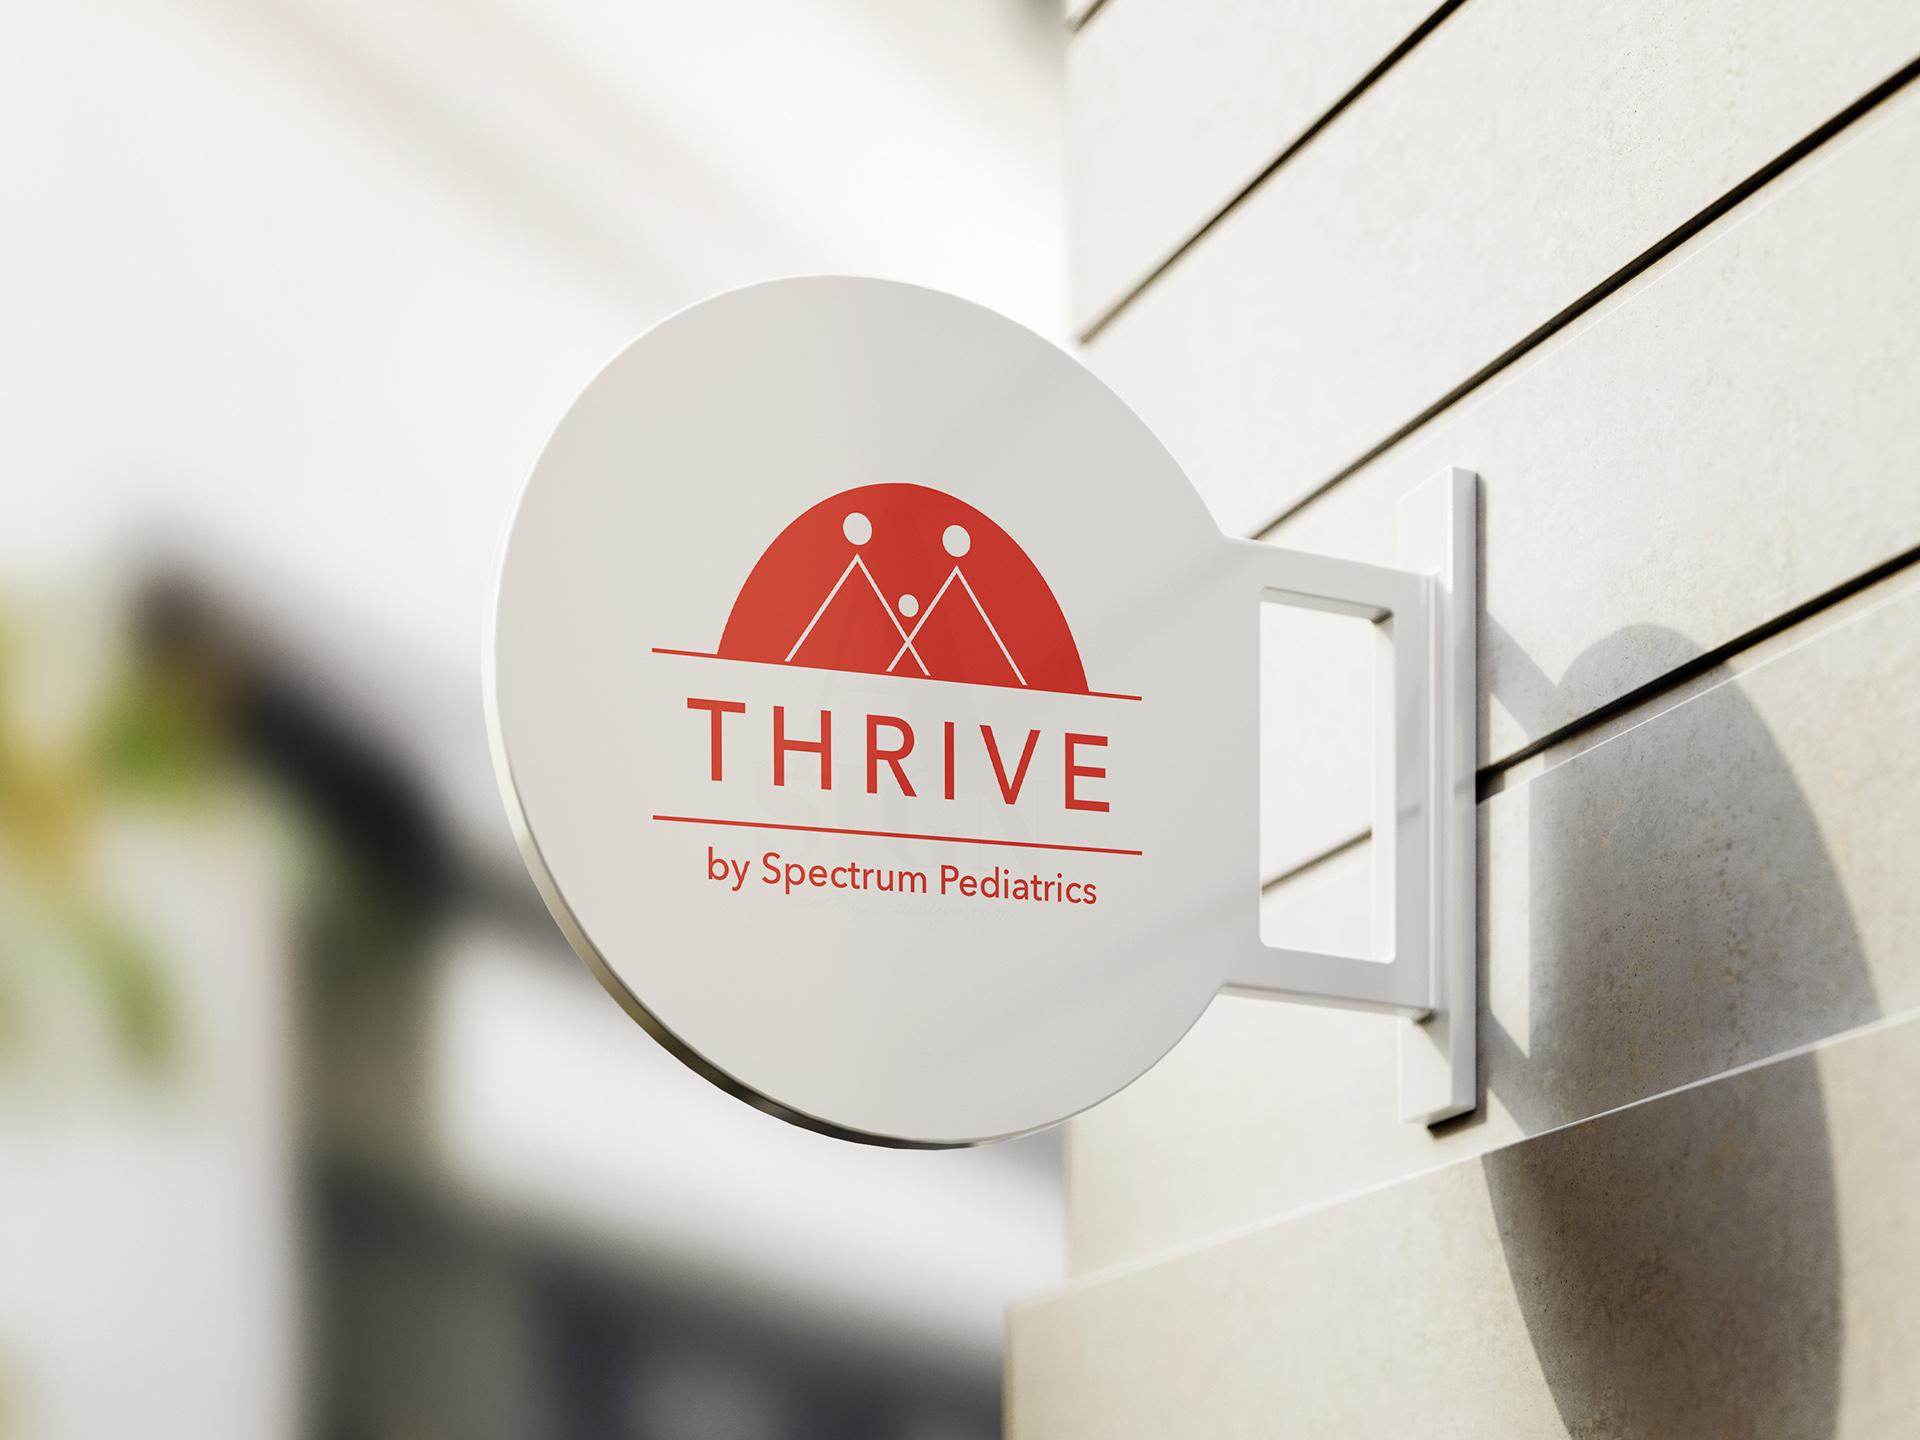 Brand Identity work for Thrive